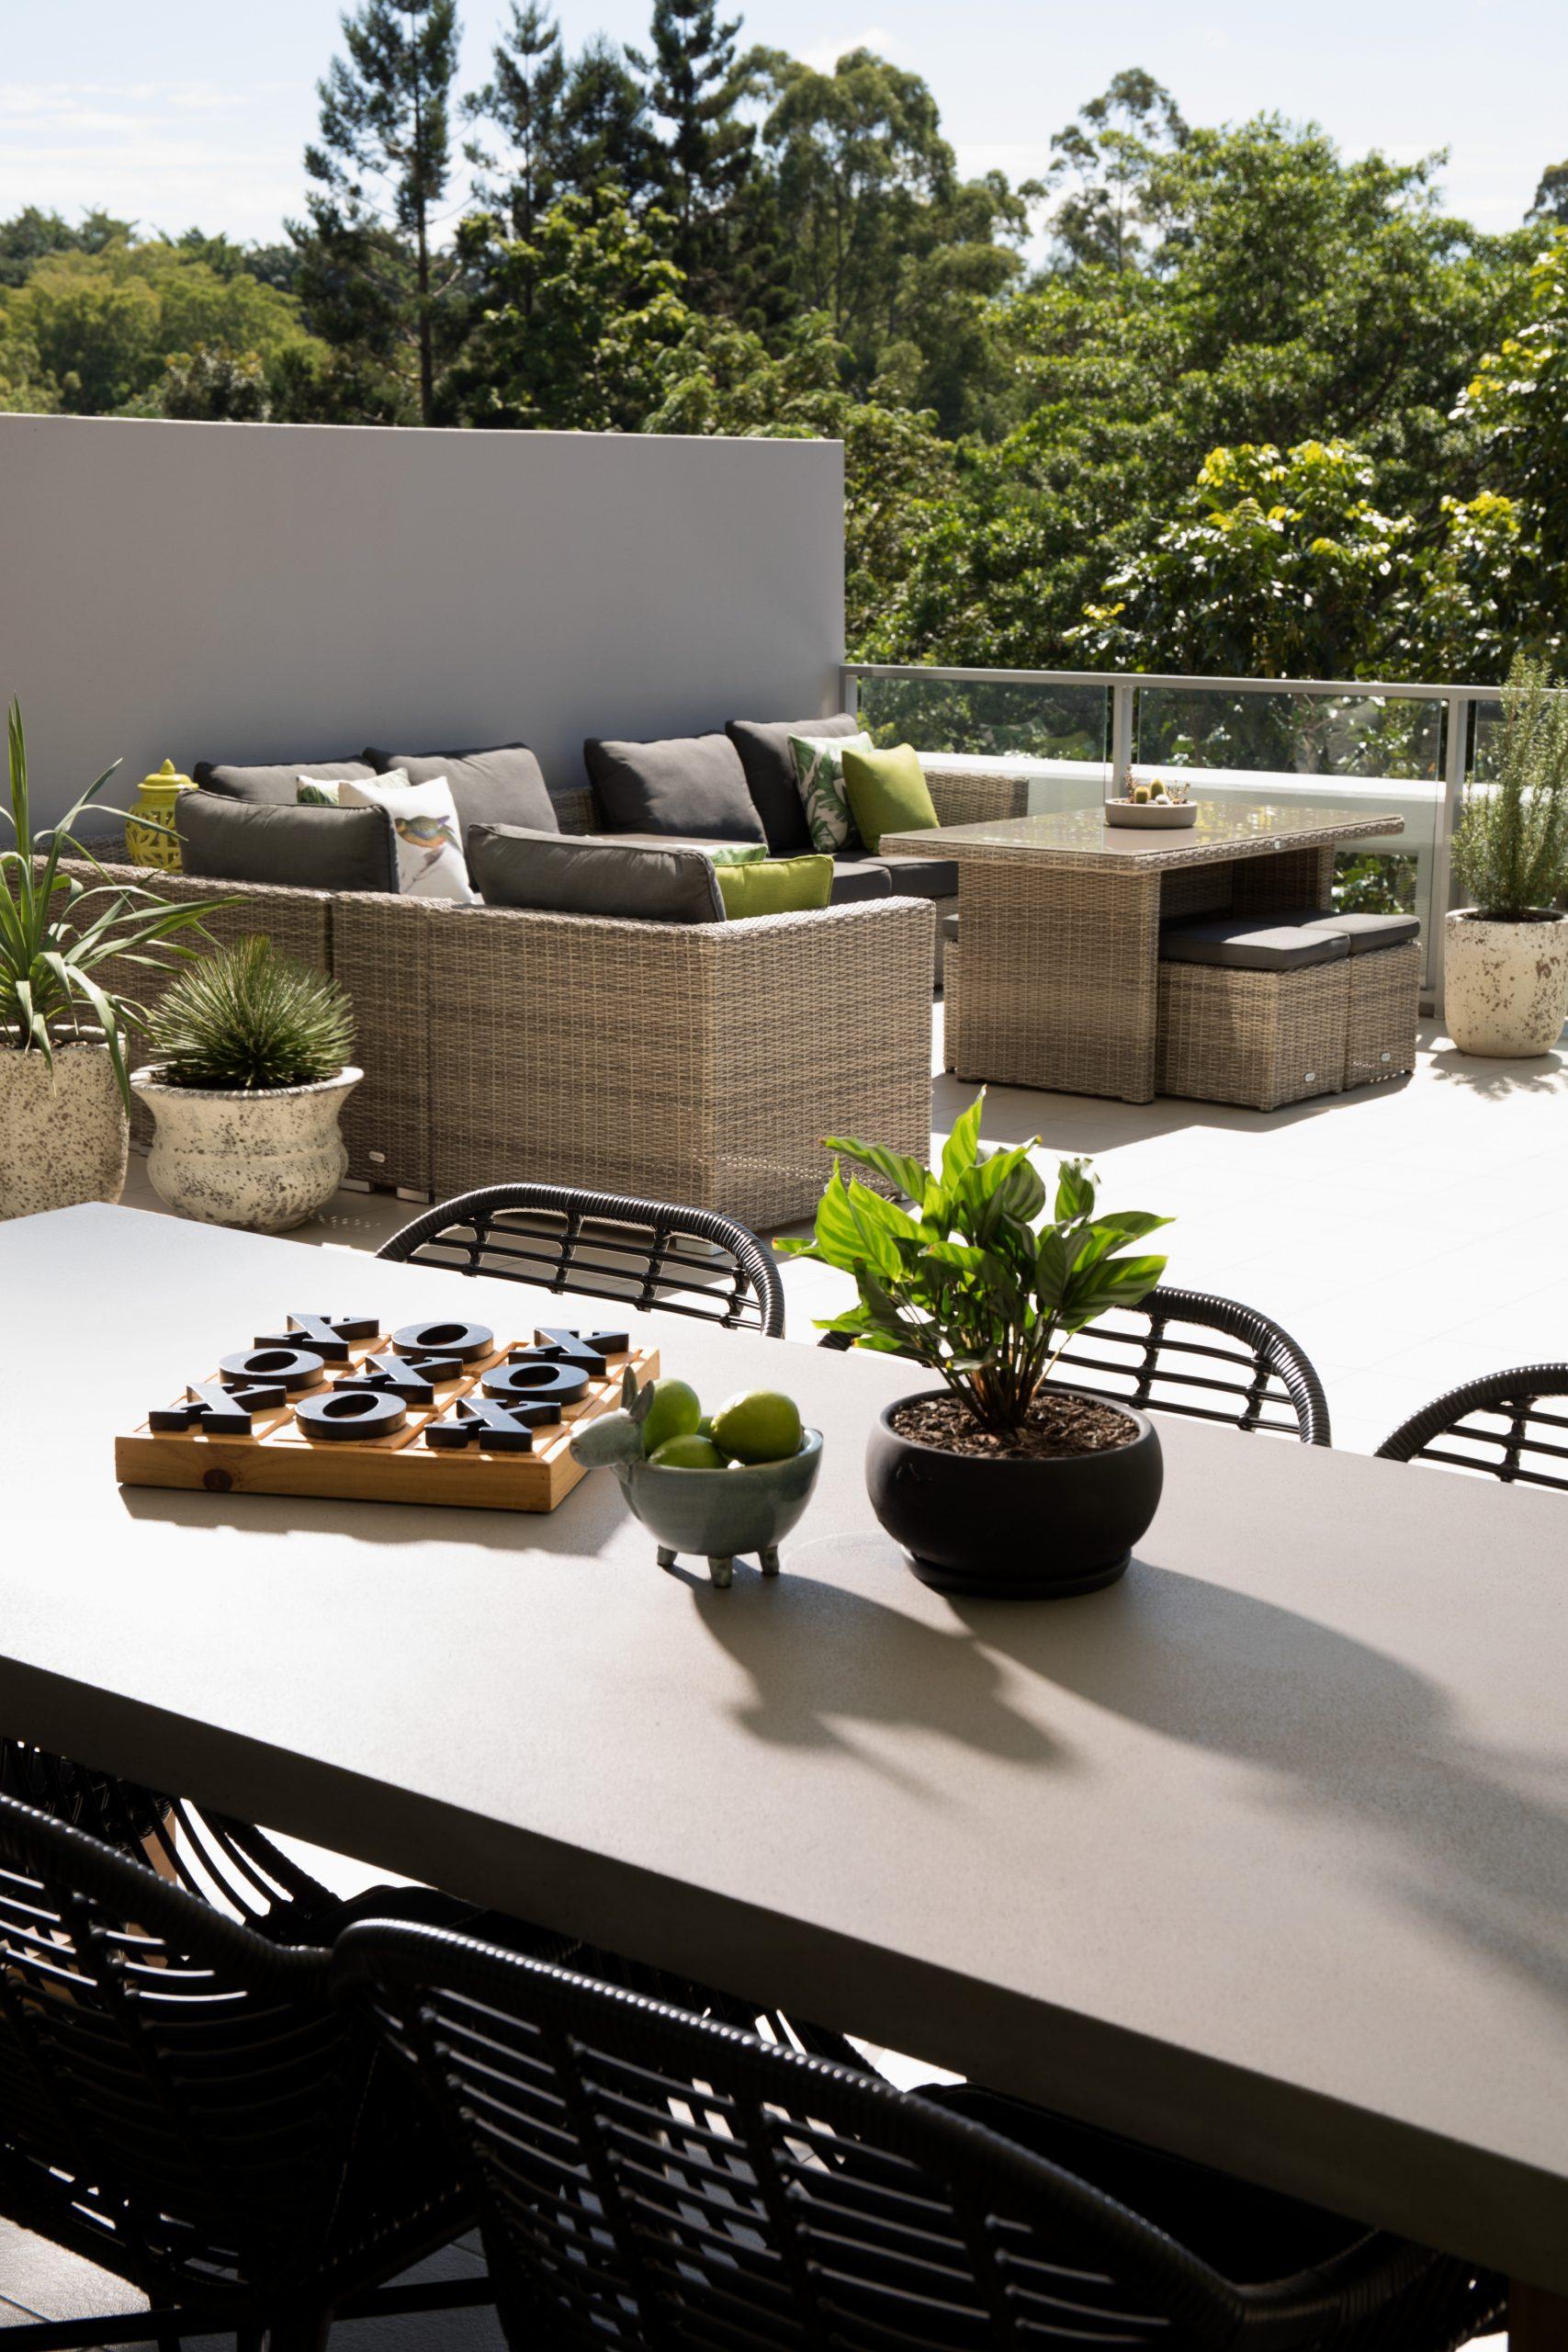 https://www.ivyandfinch.com.au/wp-content/uploads/2021/02/Roma-Street-Parklands-Interior-Design-Terrace-scaled.jpg